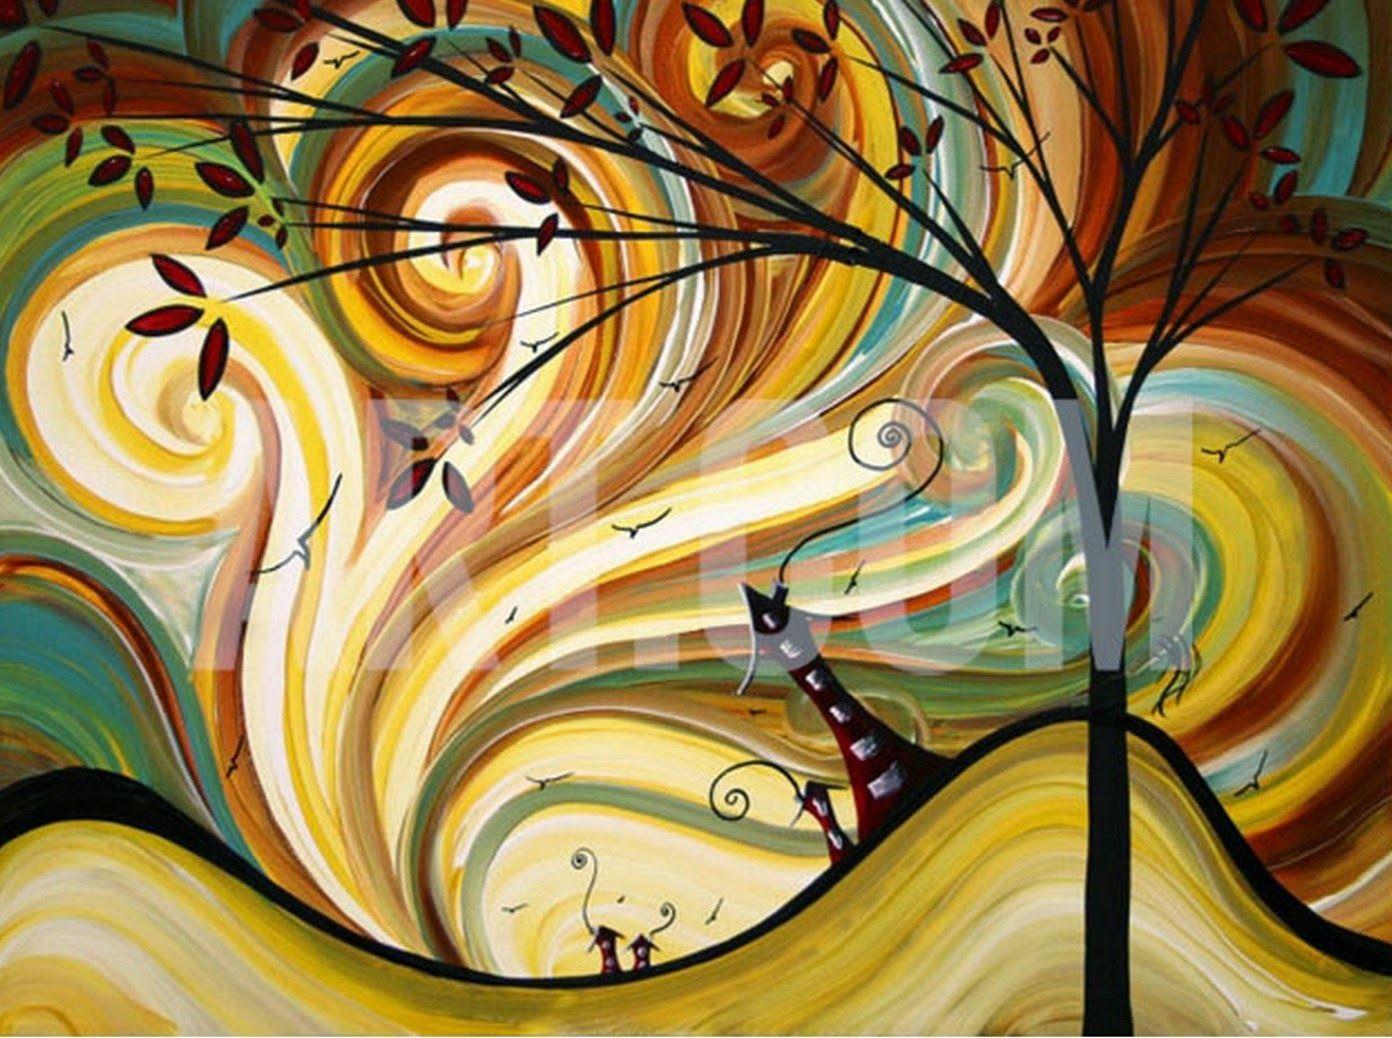 Cuadros abstractos para sala buscar con google dibujos - Fotos cuadros abstractos ...